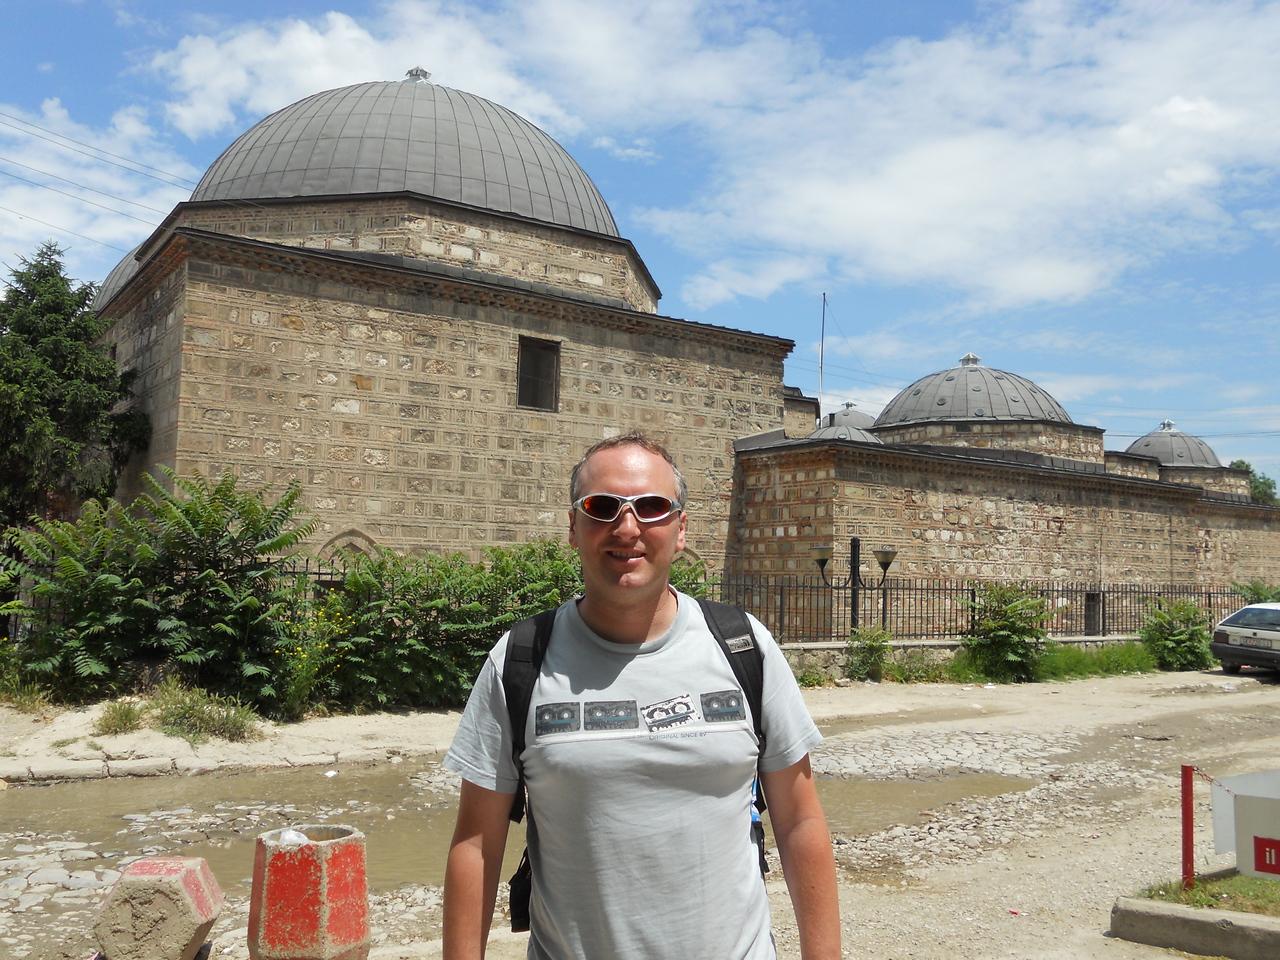 Old Hammam (Ottoman baths) in the old Turkish quarter, now an art gallery.